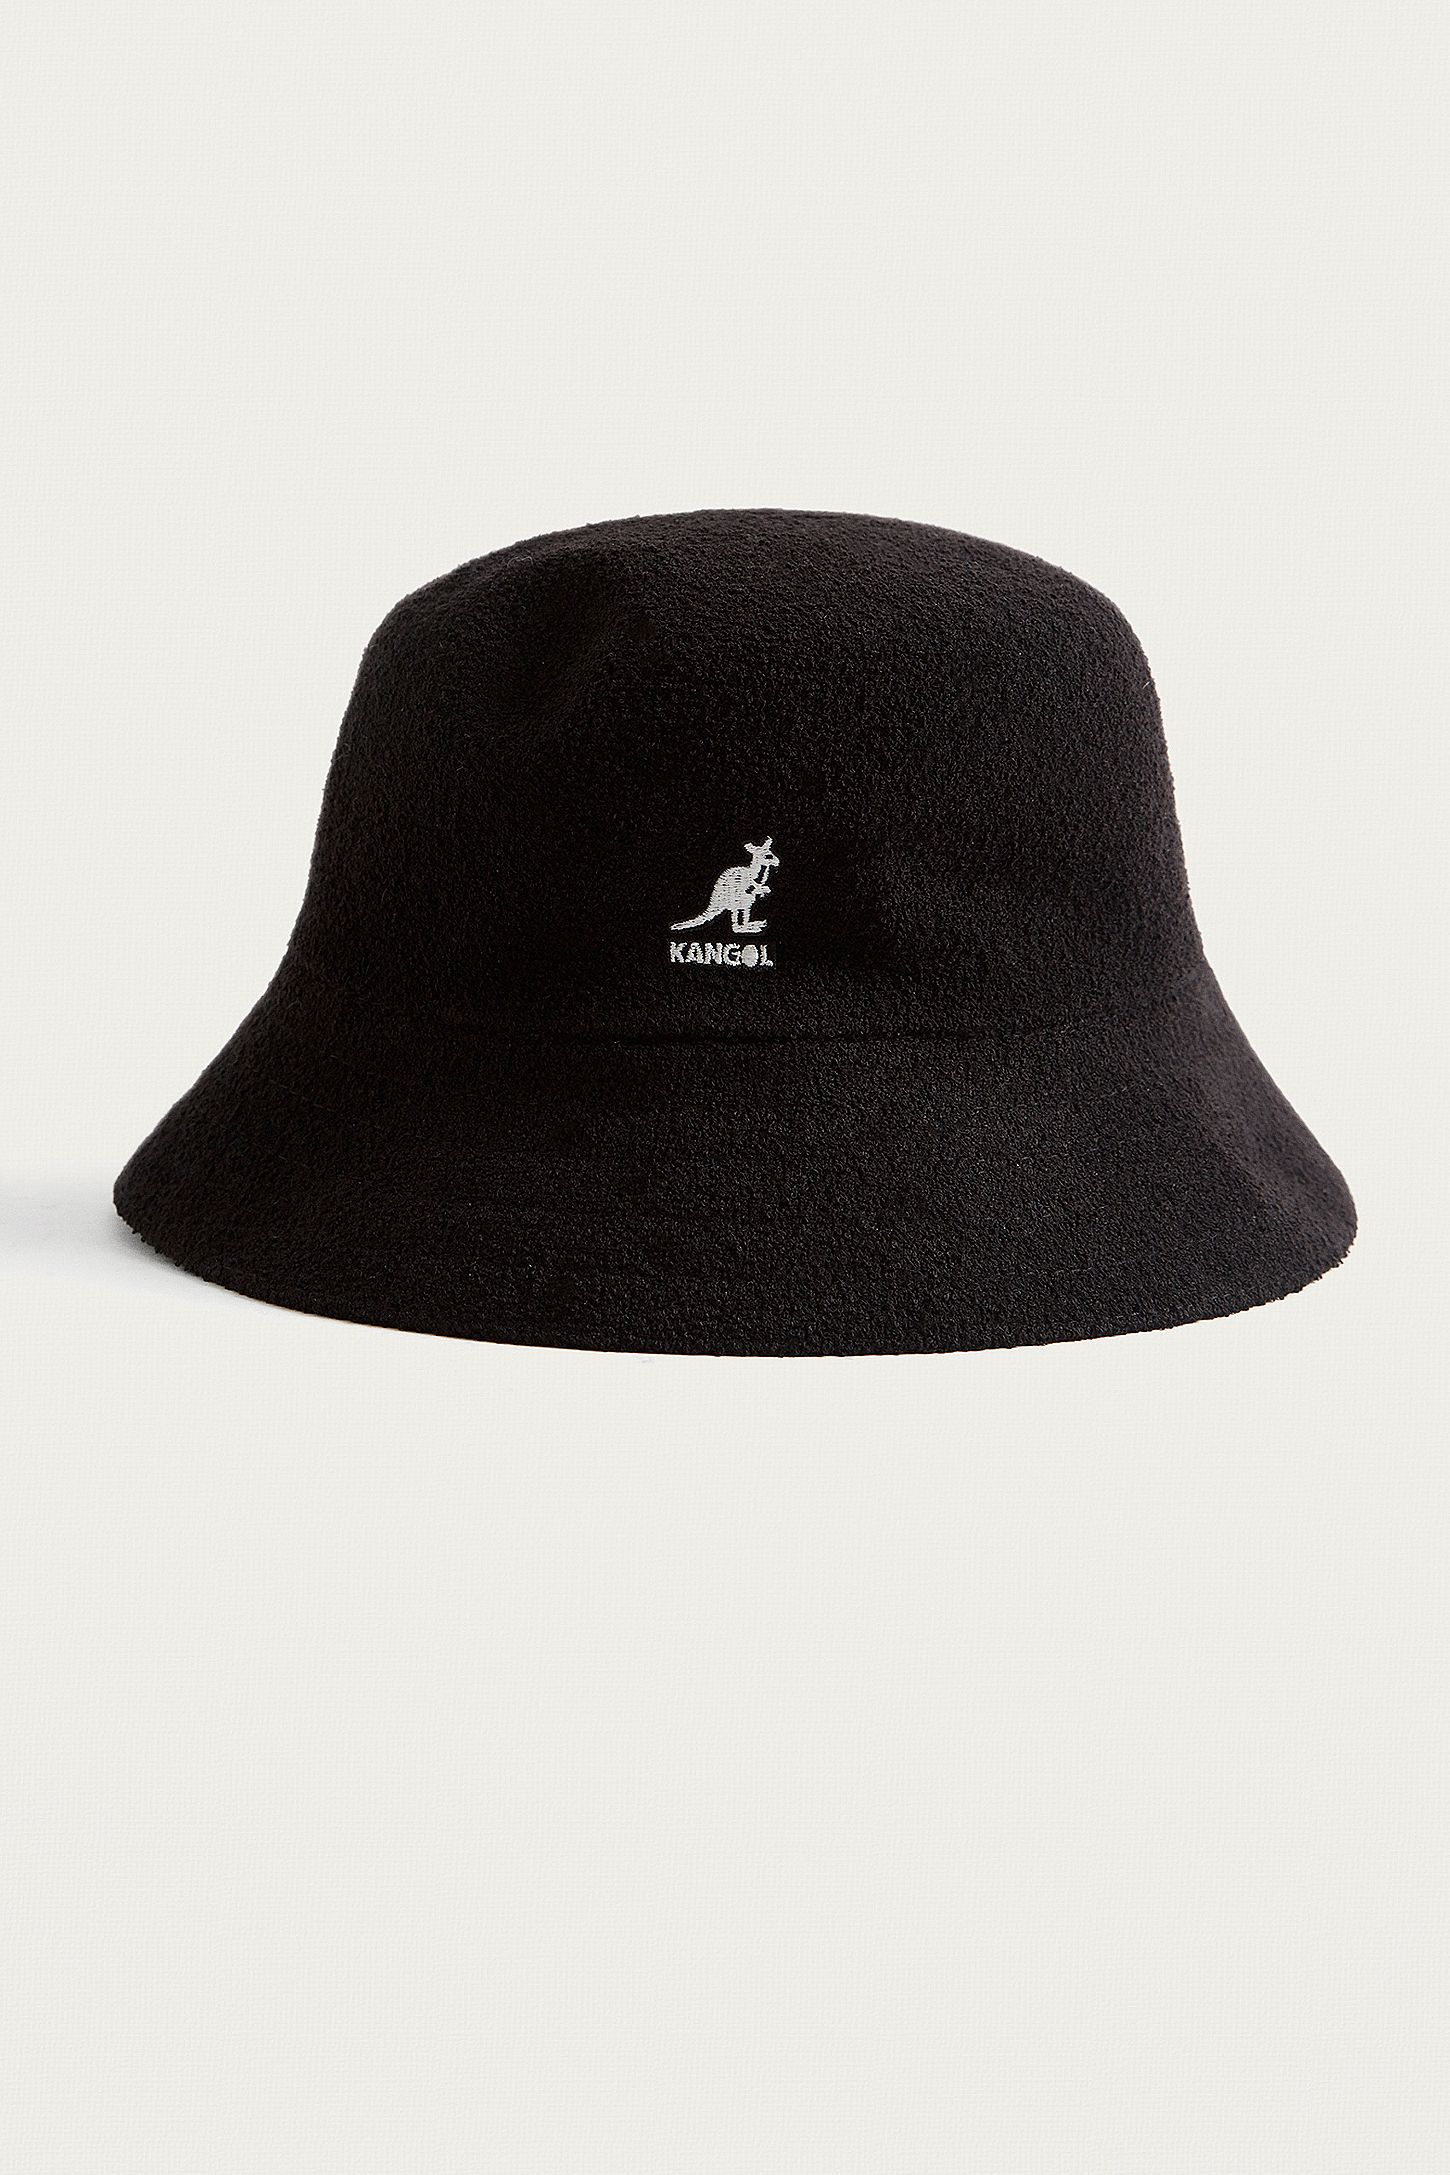 Kangol Bermuda Black Bucket Hat  867683e3950